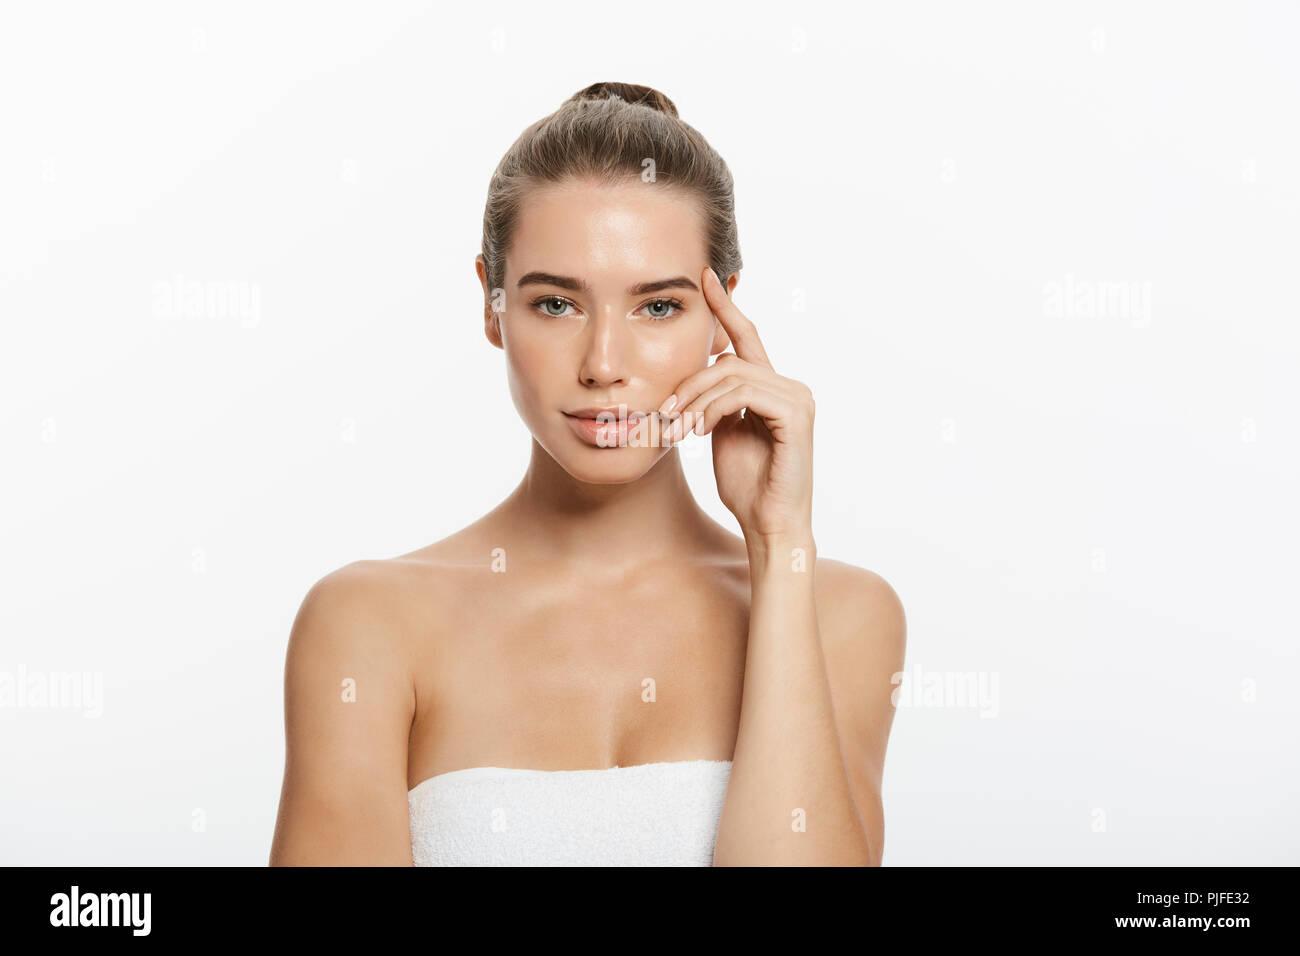 Woman Beauty Makeup Natural Face Make Up Body Skin Care Beautiful Model Touching Neck Chin Stock Photo Alamy